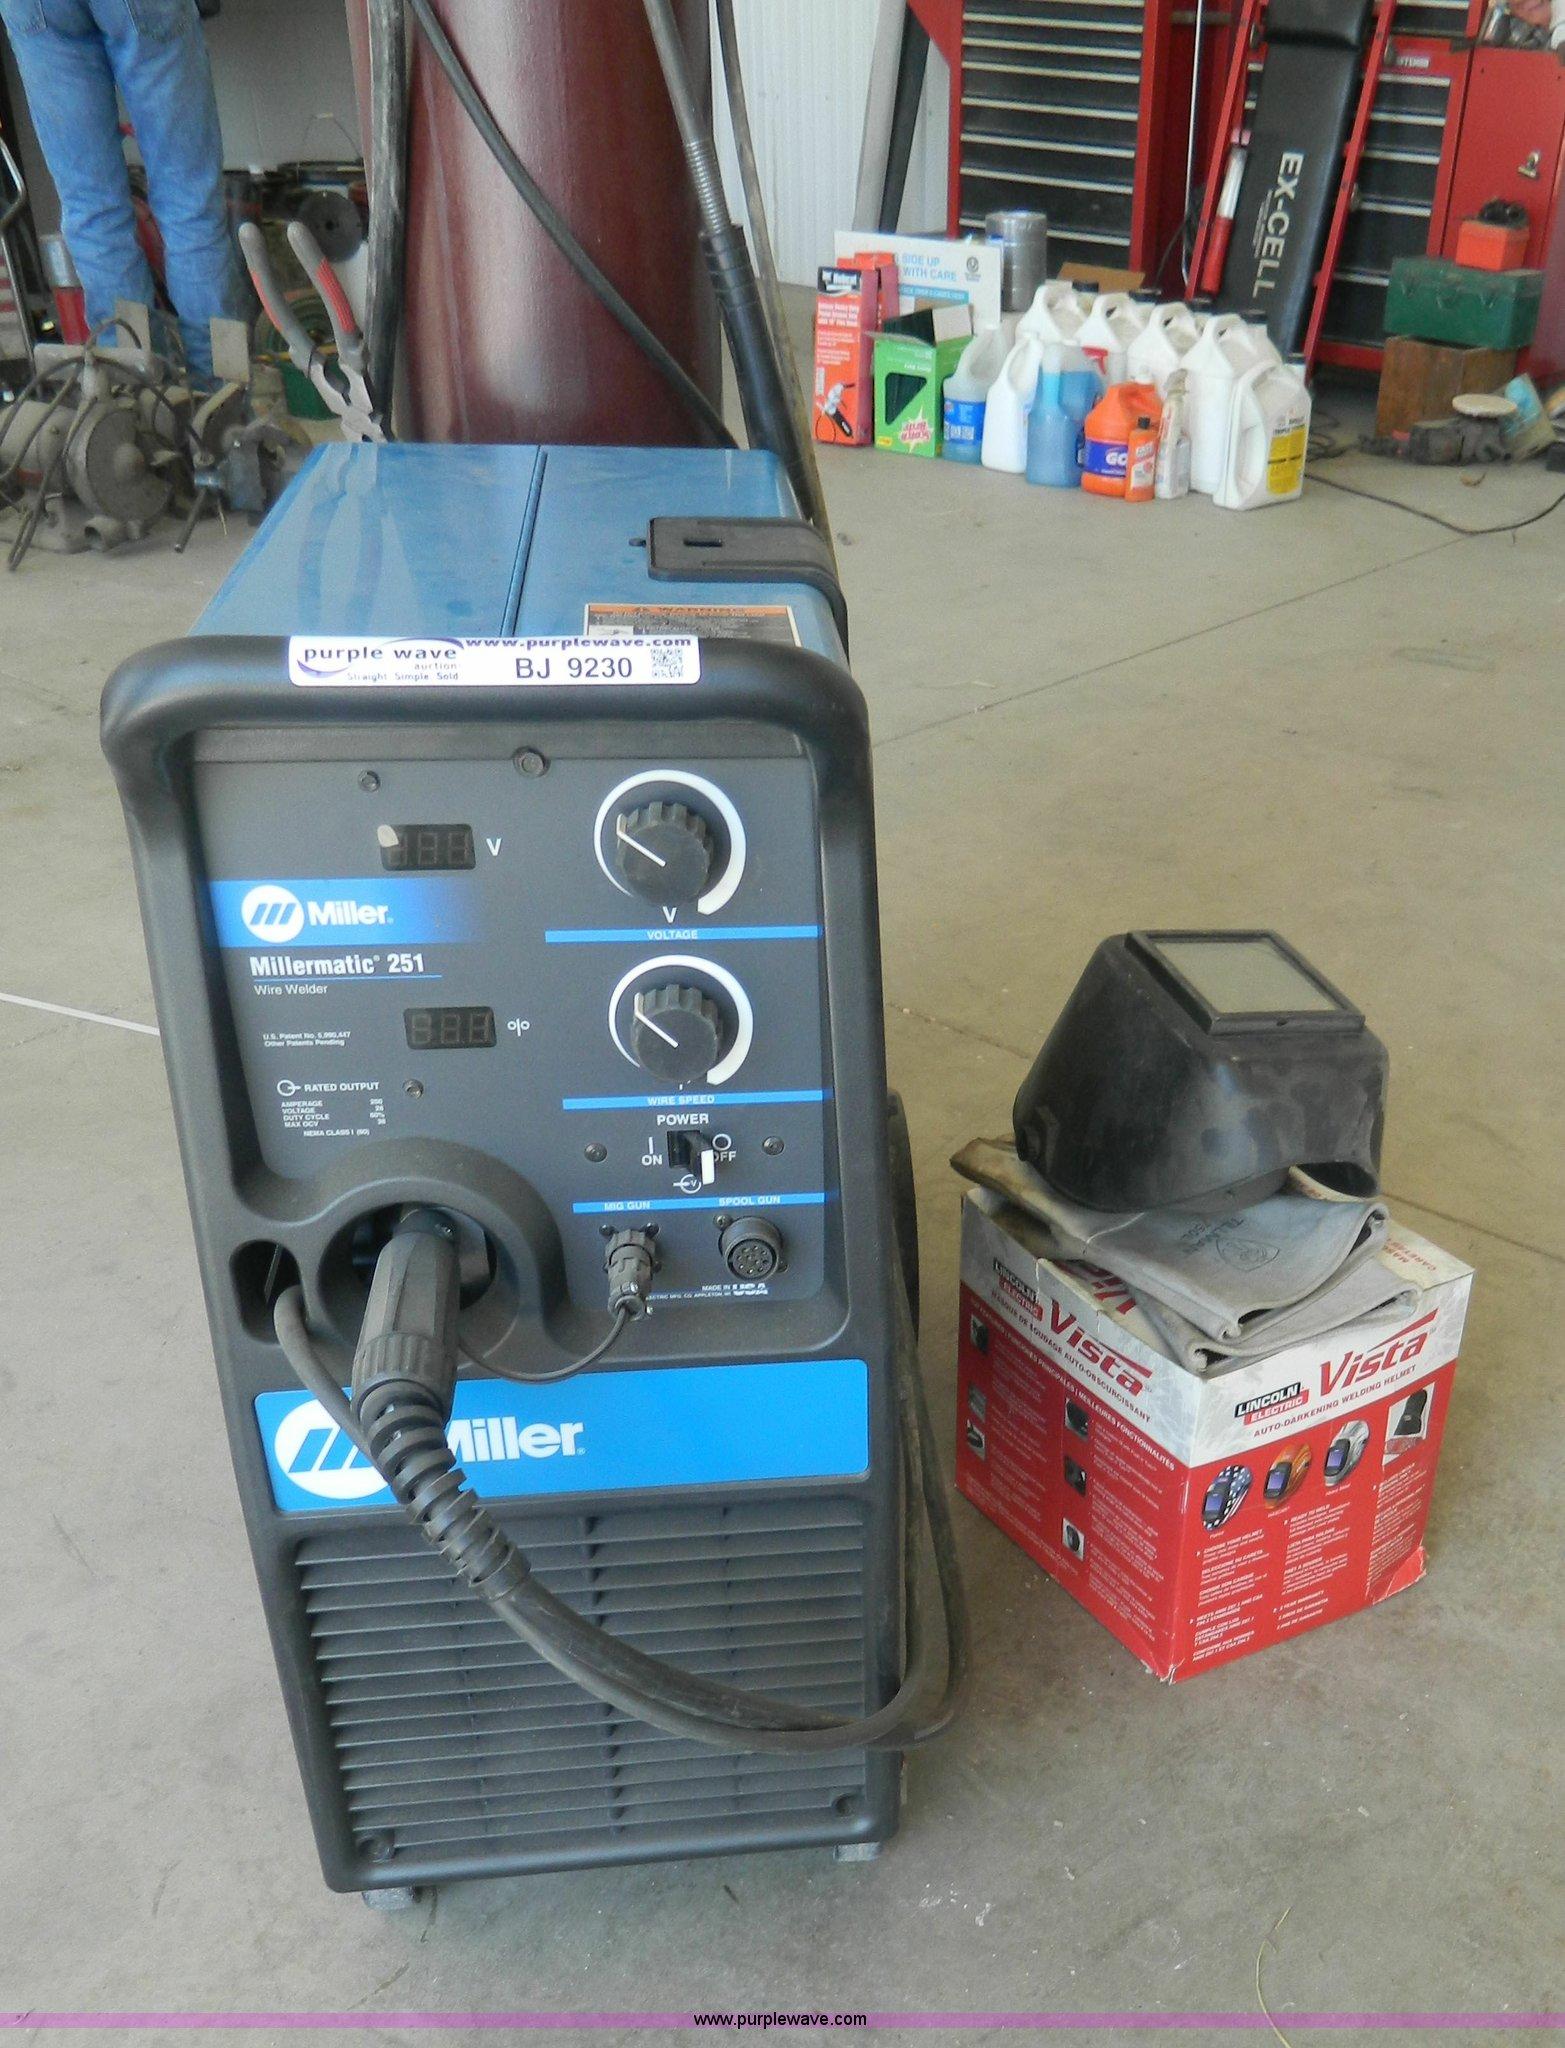 Miller MillerMatic 251 wire feed welder | Item BJ9230 | SOLD...